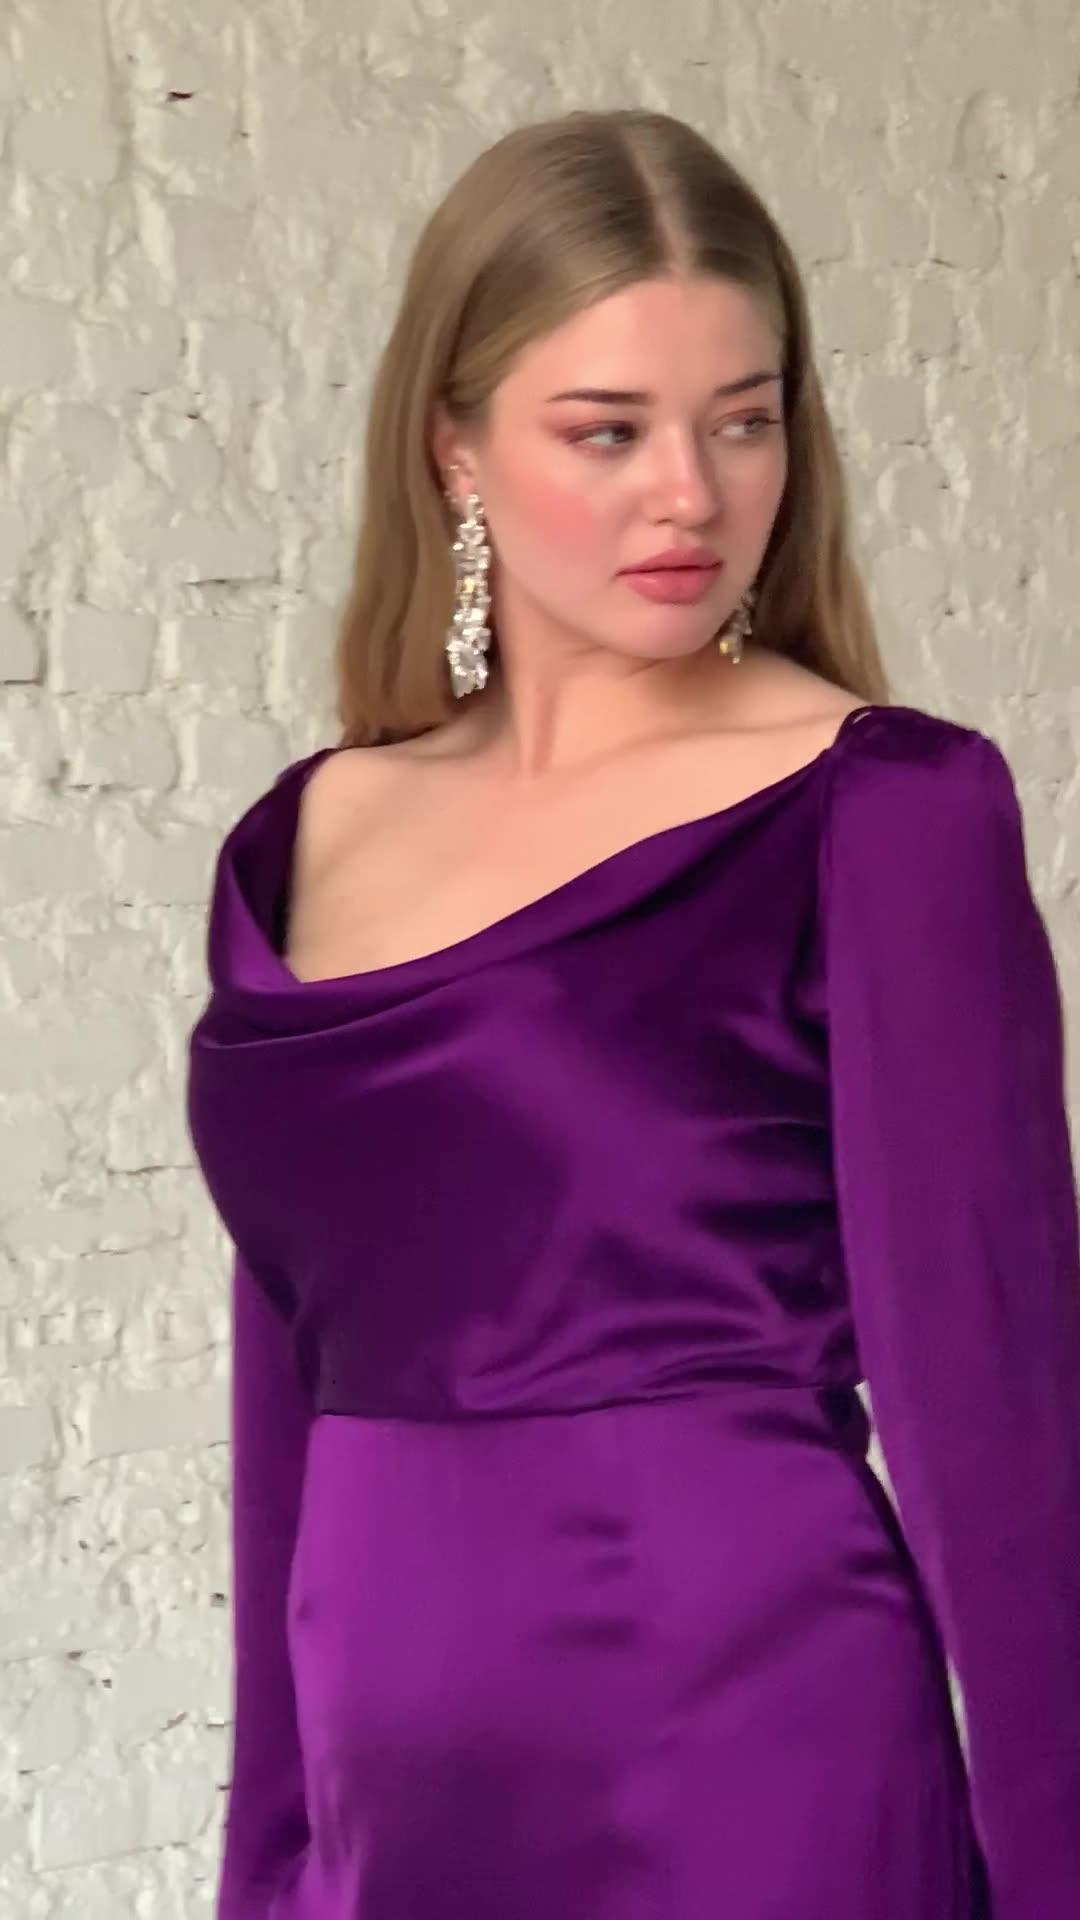 2020 Summer Autumn Casual Jacquard Satin Floral Sofi & Sofi Dress Woman Dress high quality sexy High Quality Made in Turkey